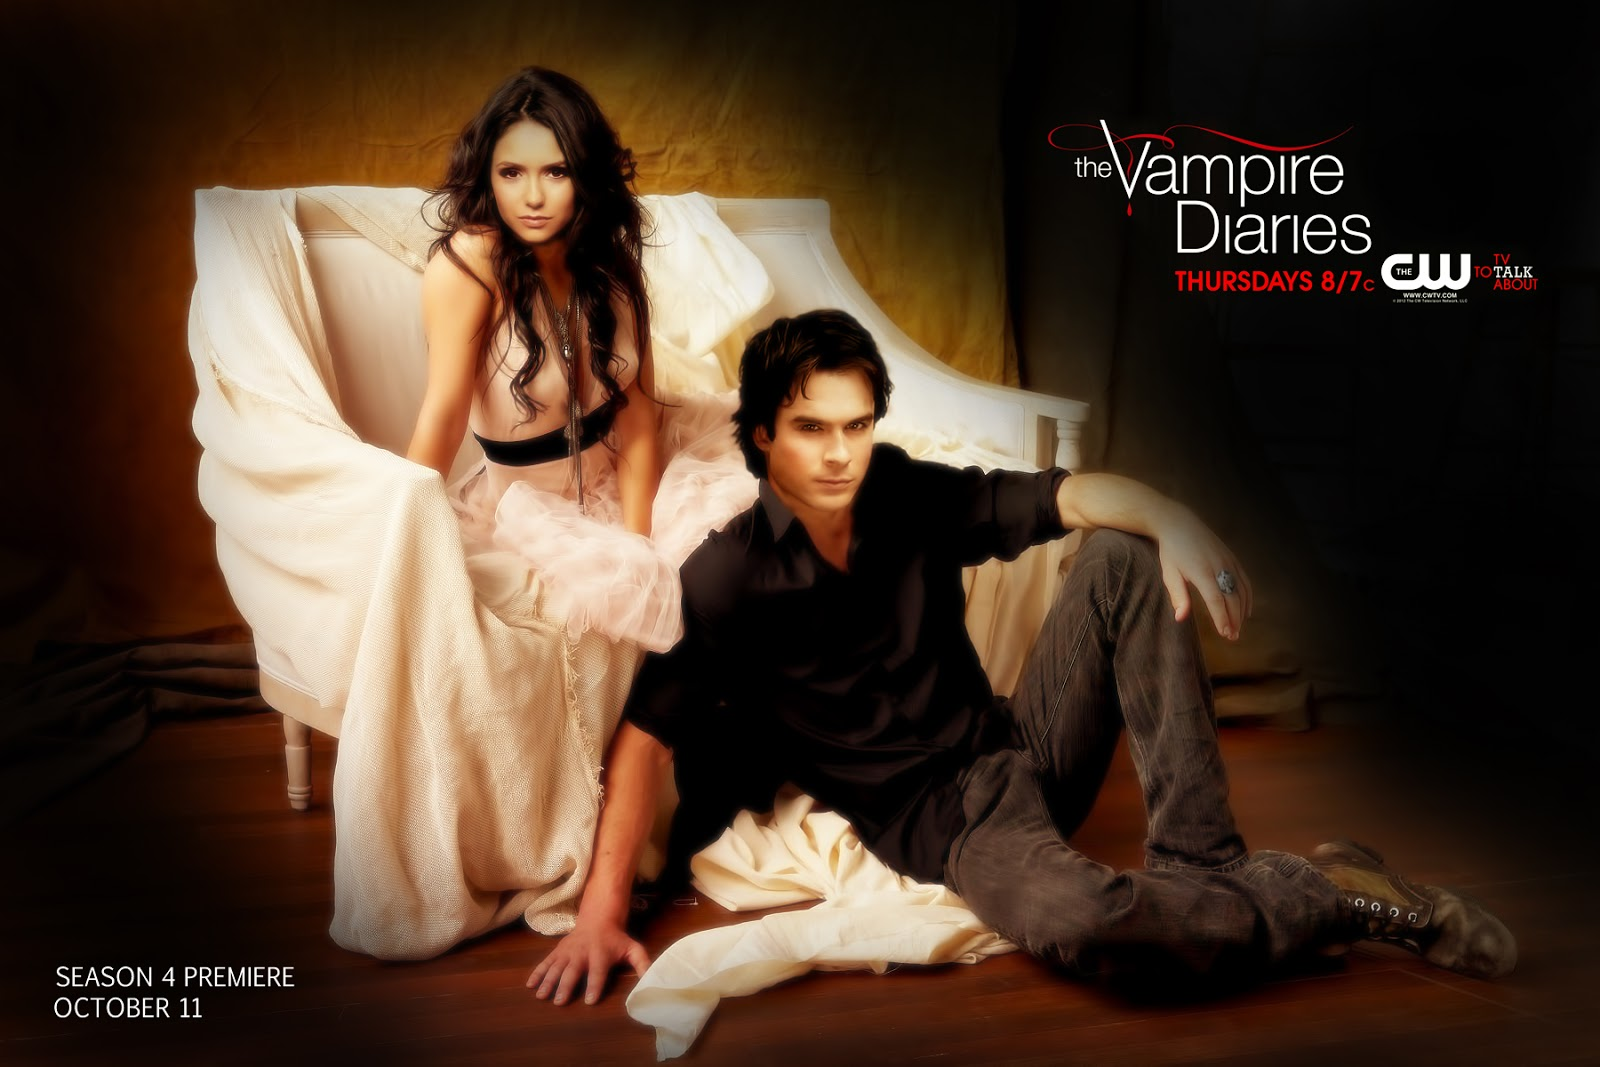 http://3.bp.blogspot.com/-1hFZ6gu0JlM/UHb4hKyqVJI/AAAAAAAABkA/0bGaqOhF4kY/s1600/The-Vampire-Diaries-Season-4-the-vampire-diaries-31725106-1800-12001.jpg